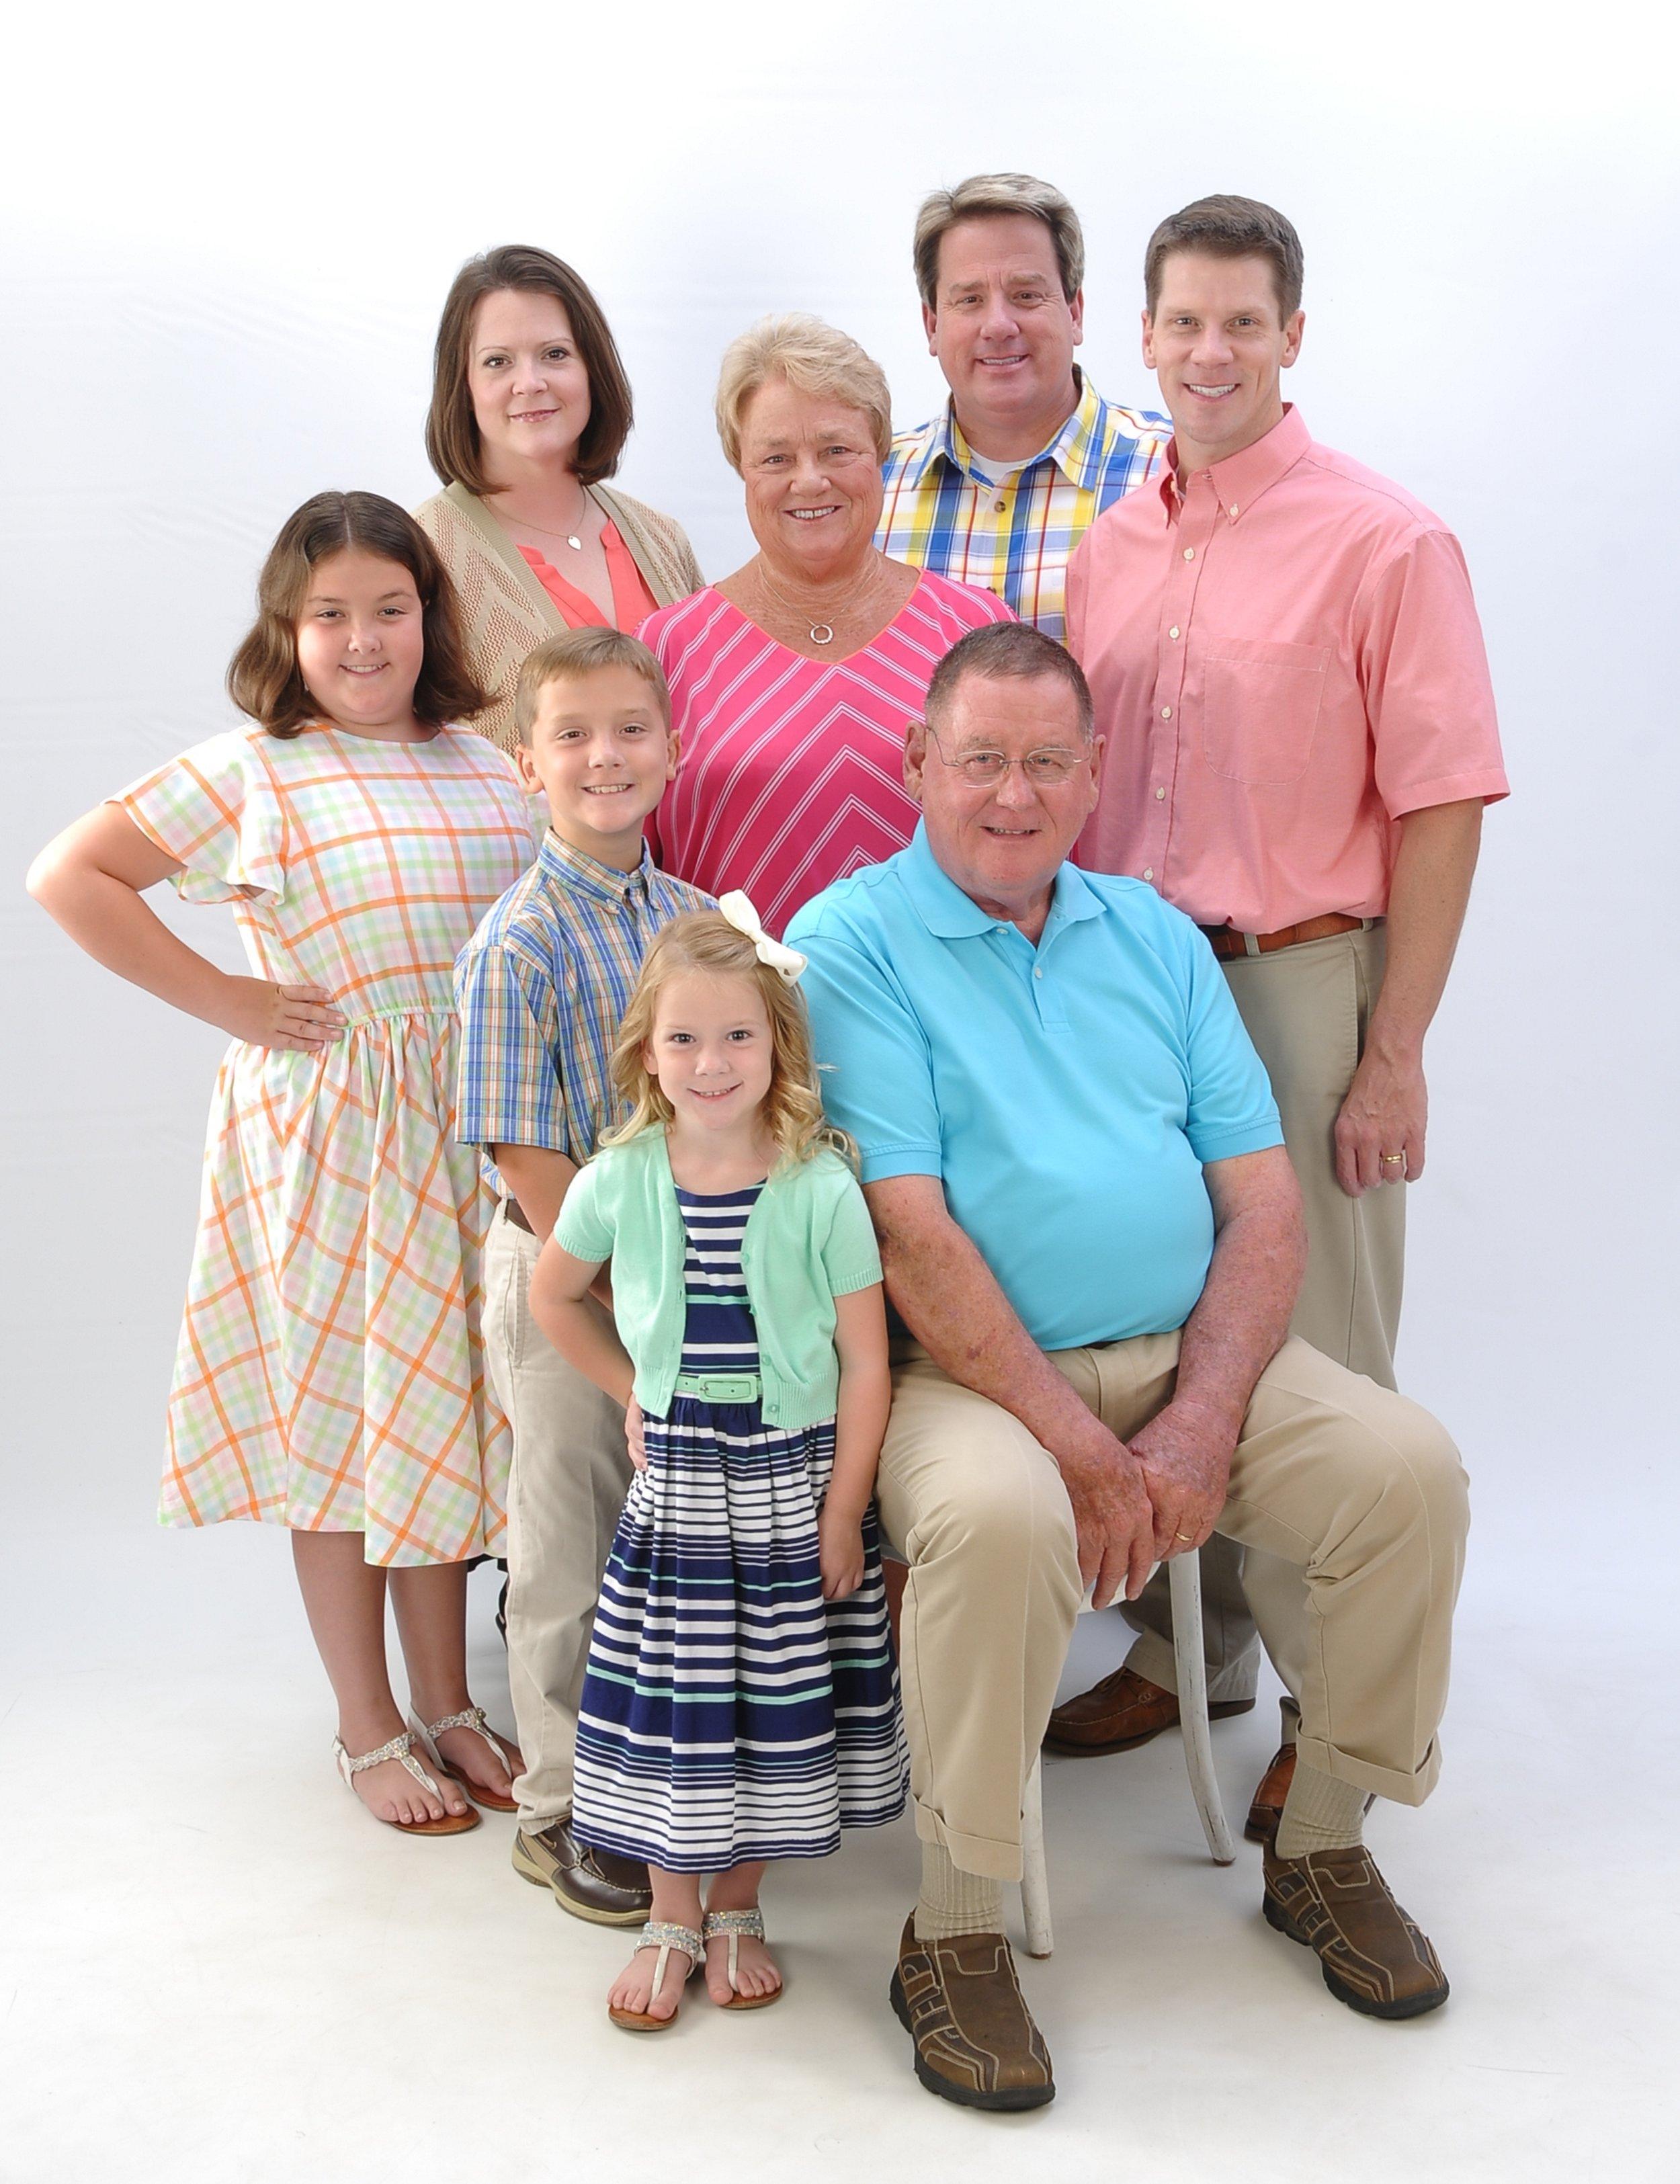 Whole Family 2019 HI RES.jpg